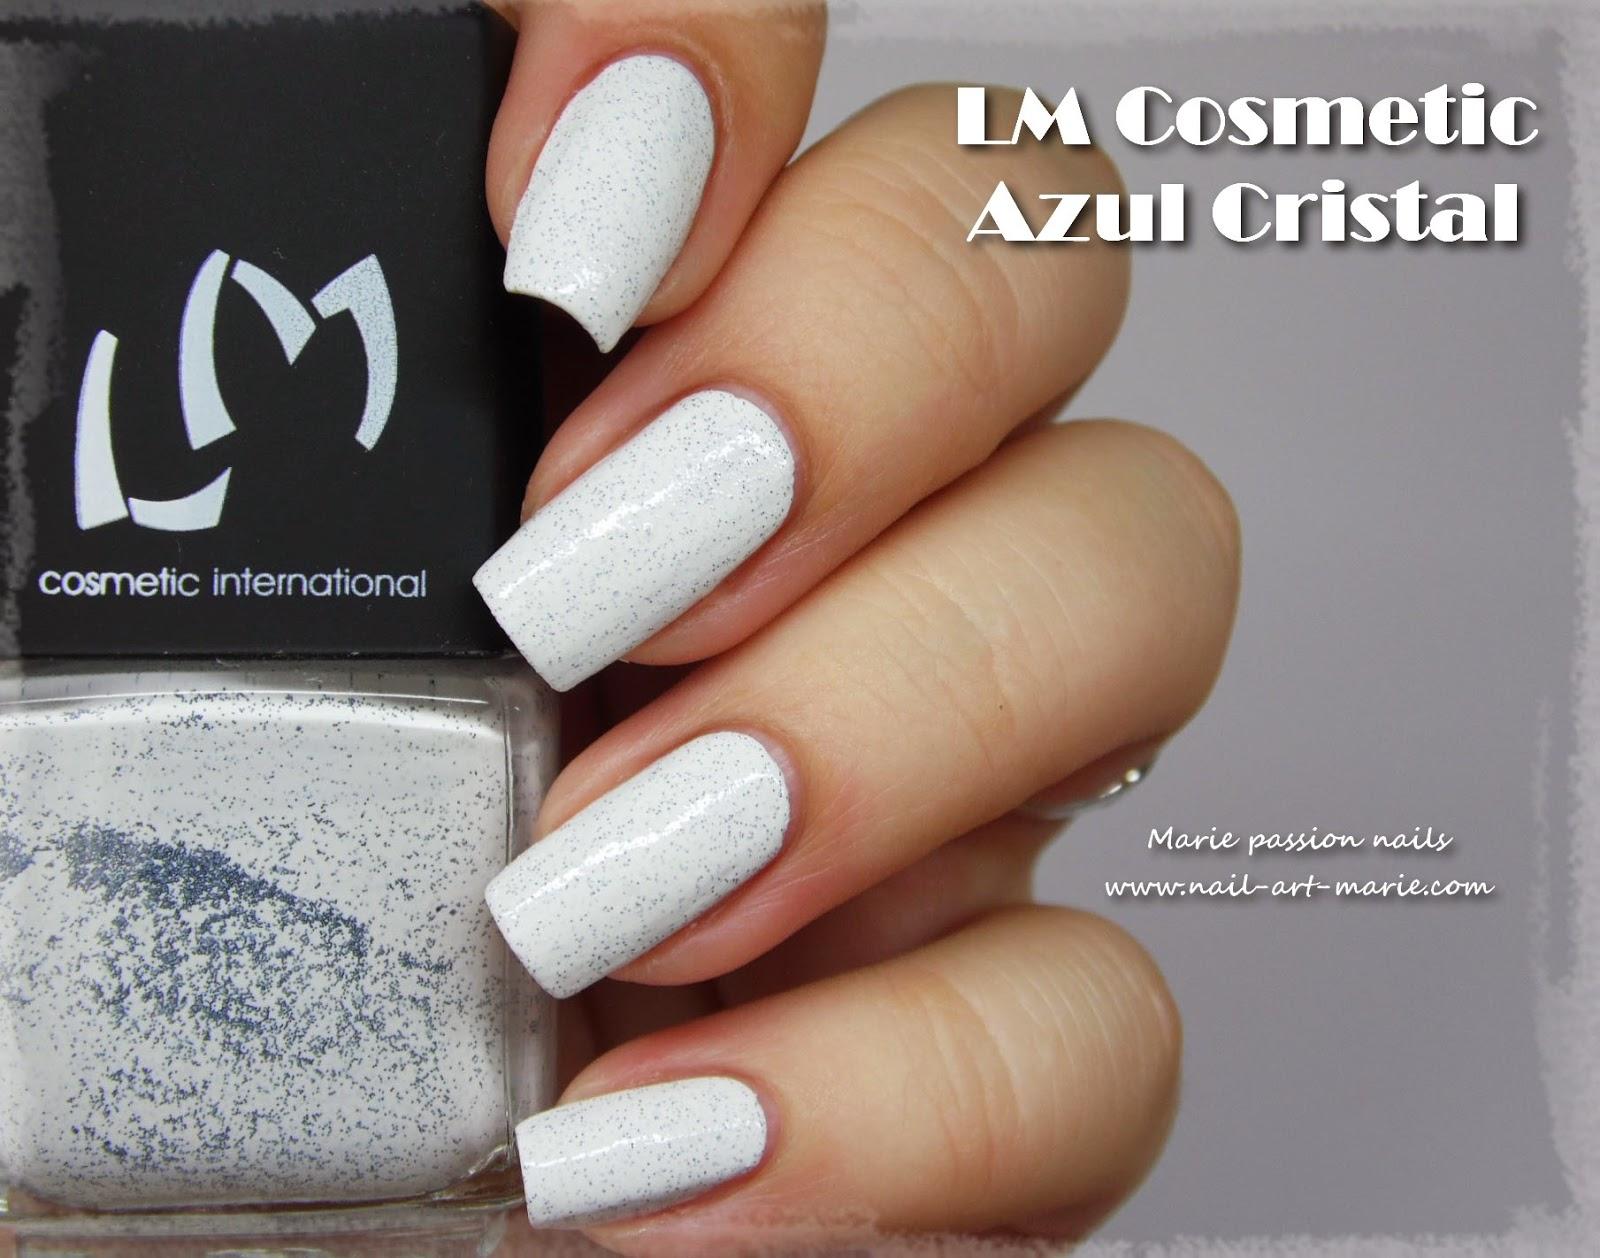 Lm Cosmetic Azul Cristal1